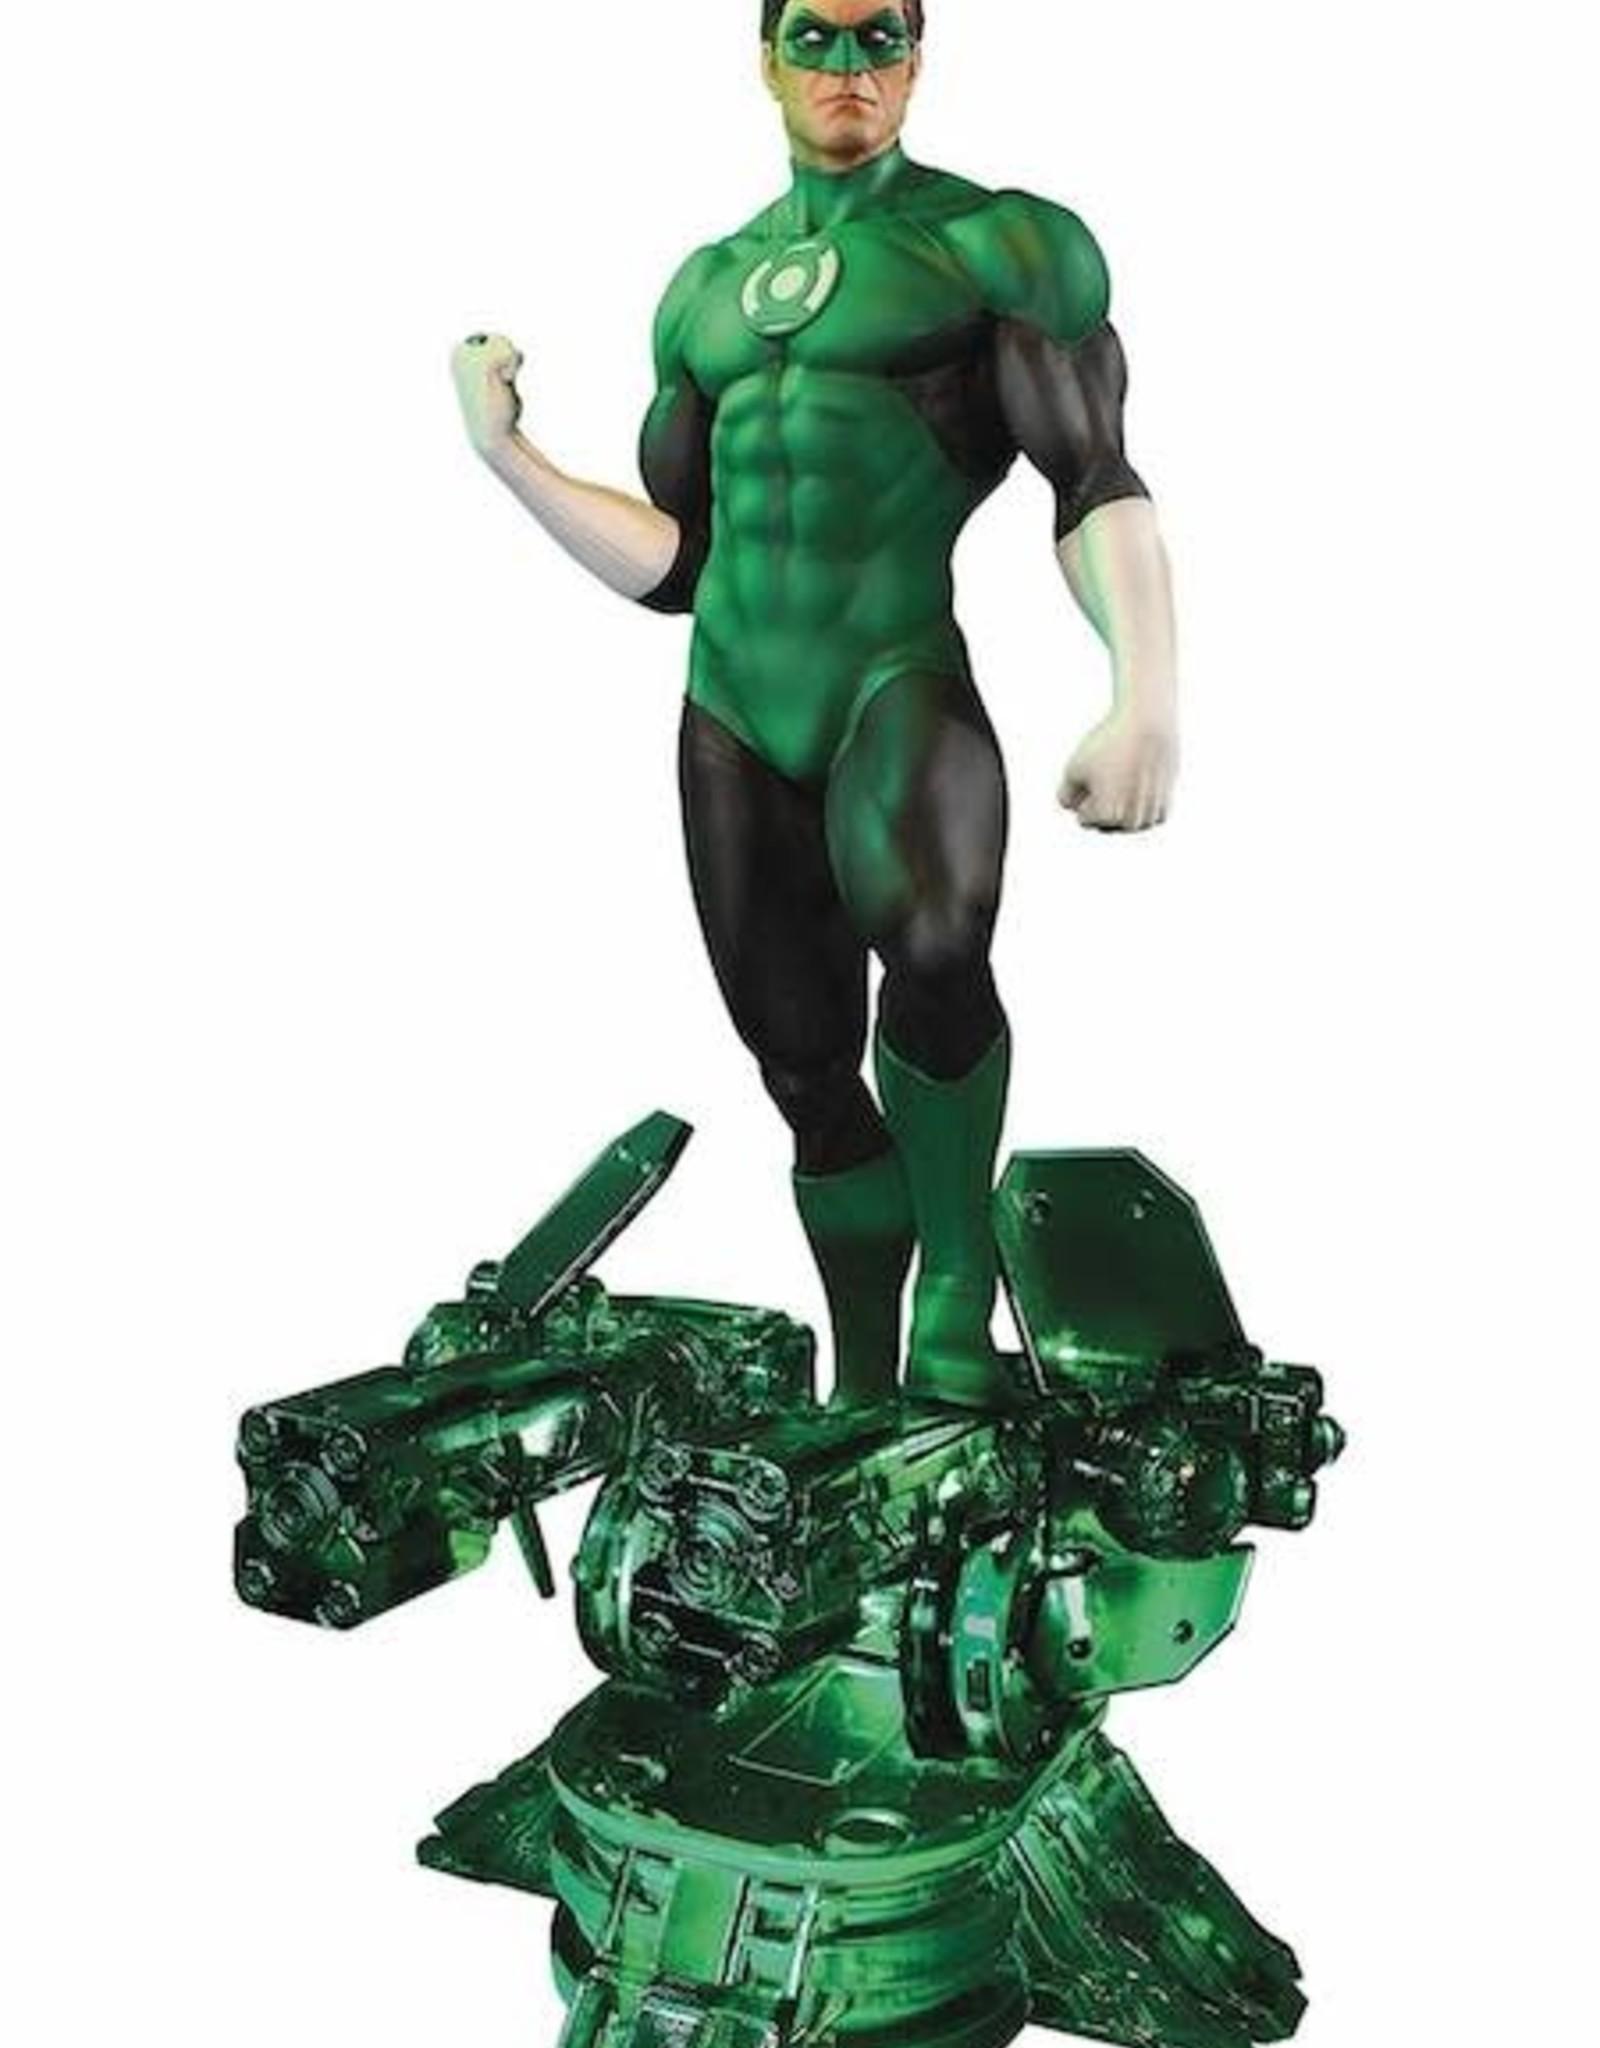 Tweeterhead DC Heroes Green Lantern 16in Limited Edition Maquette